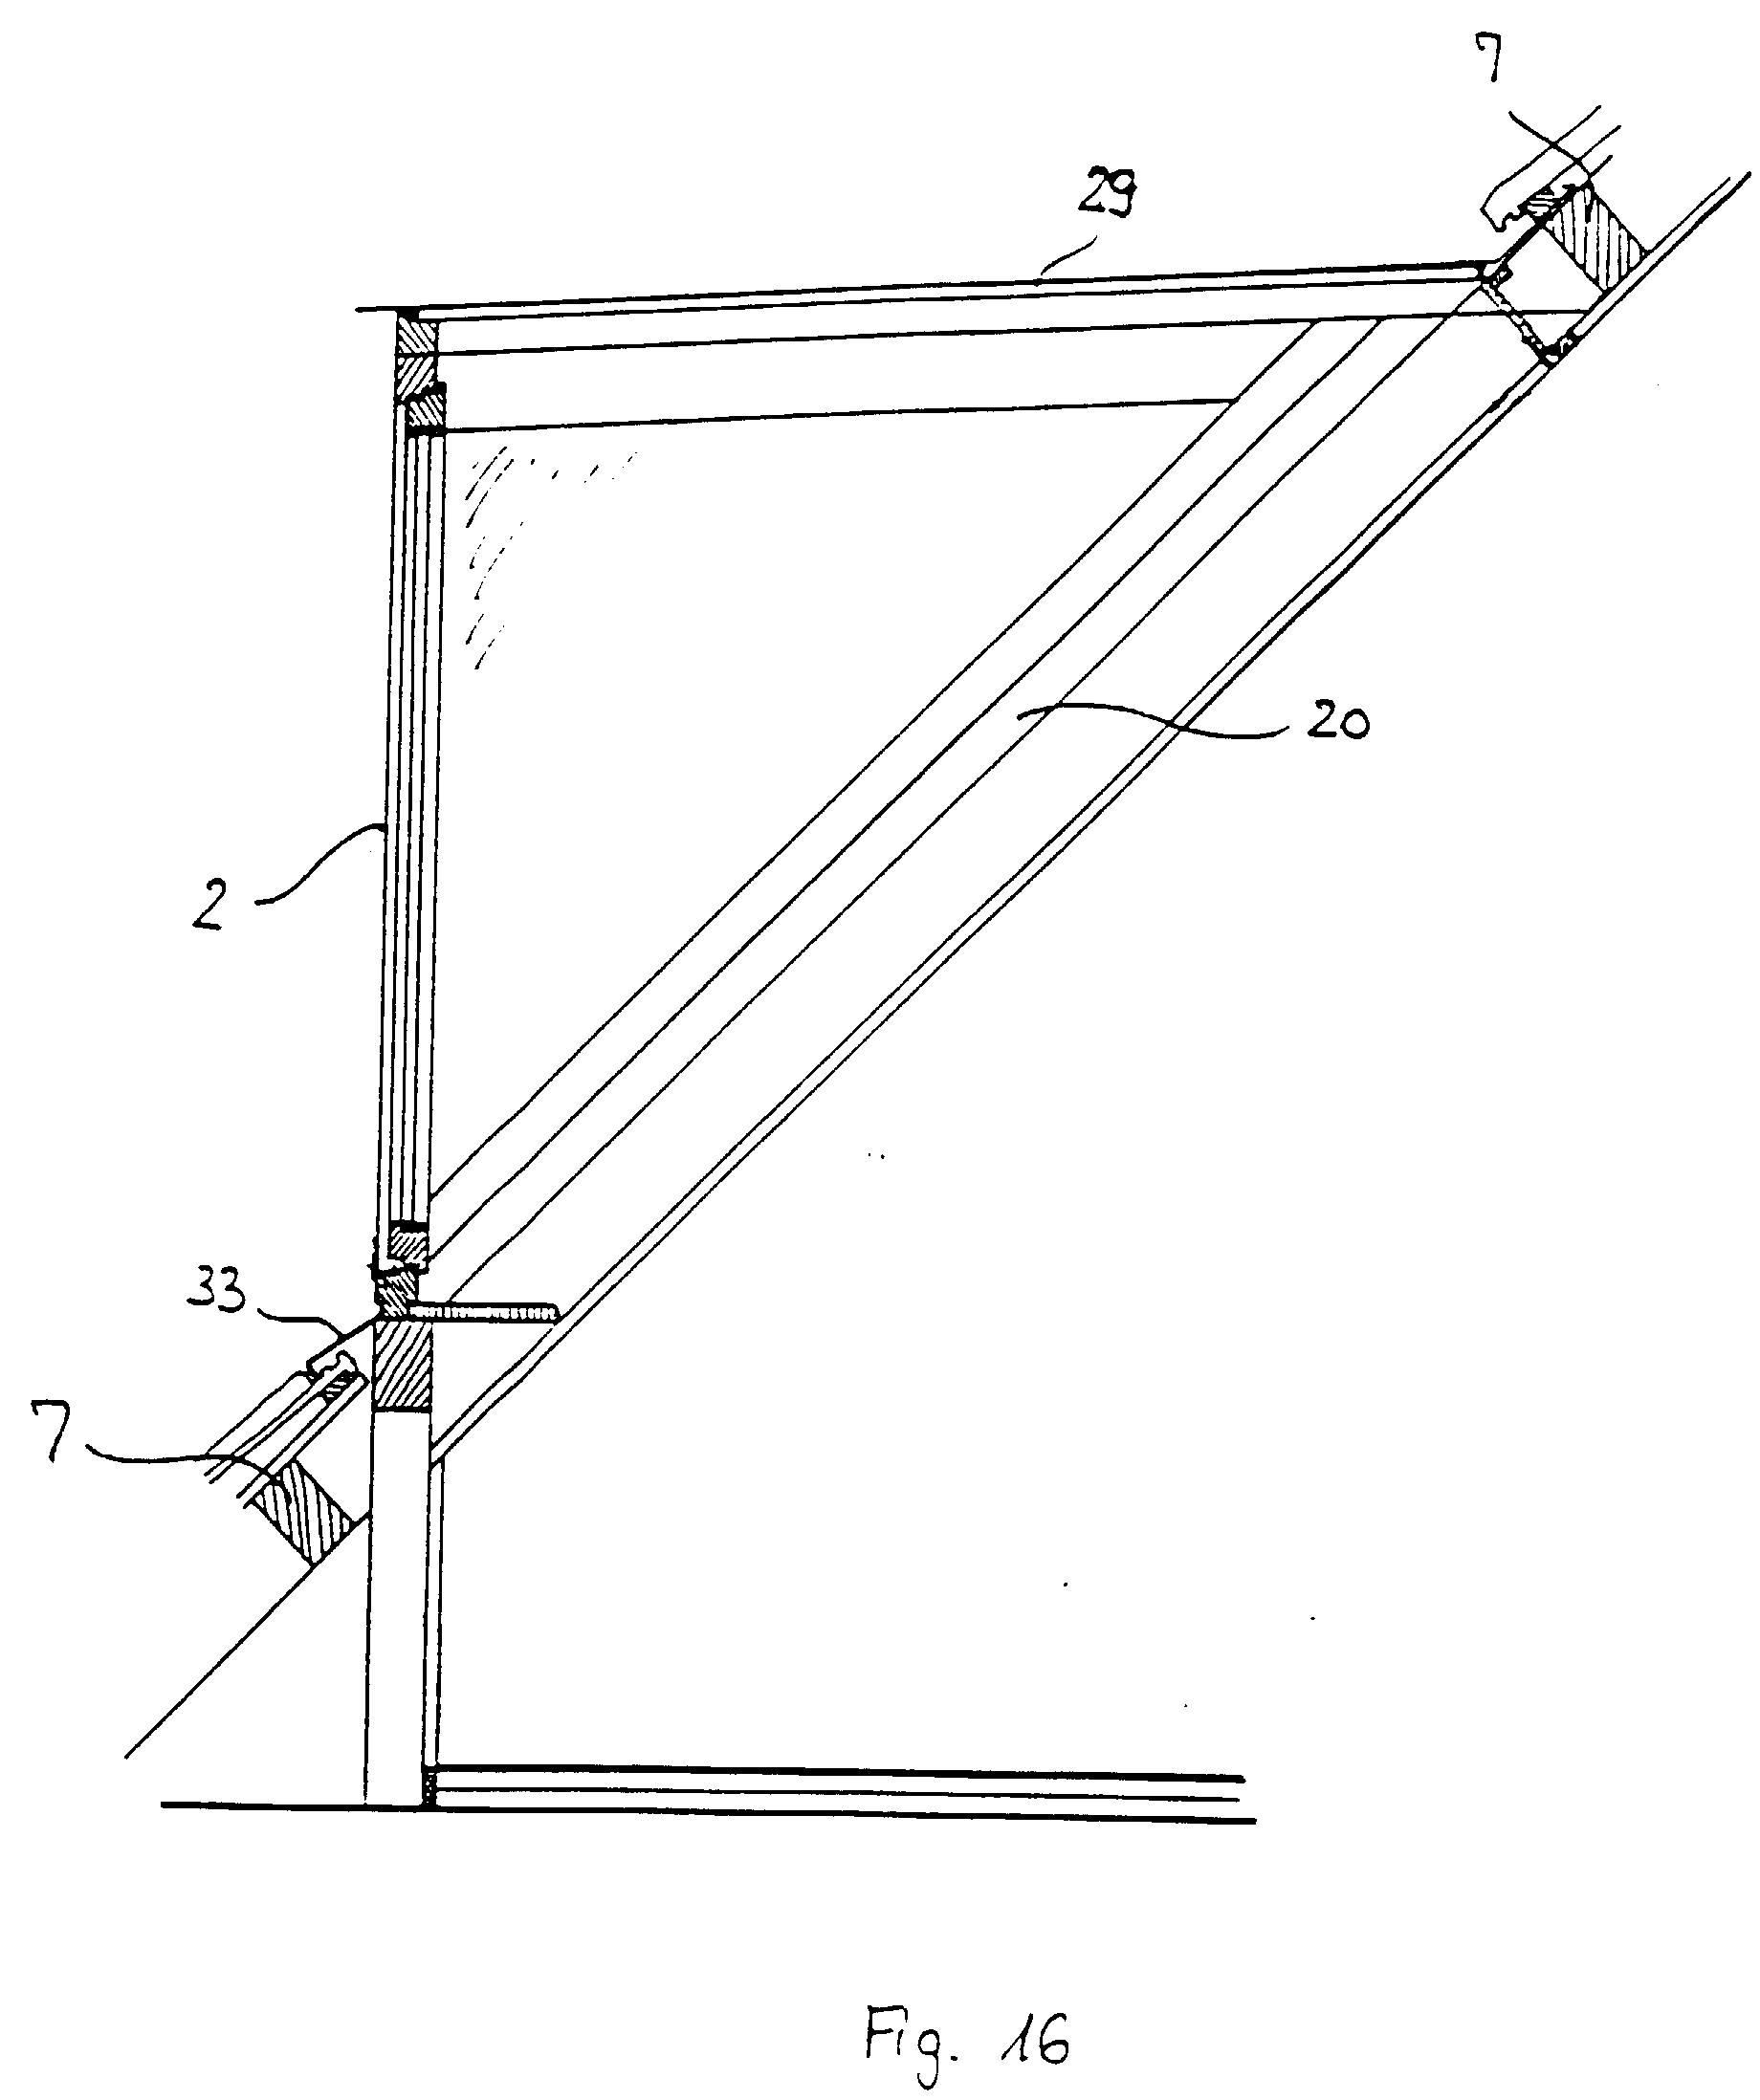 patent ep0750707b1 roof dormer google patents. Black Bedroom Furniture Sets. Home Design Ideas